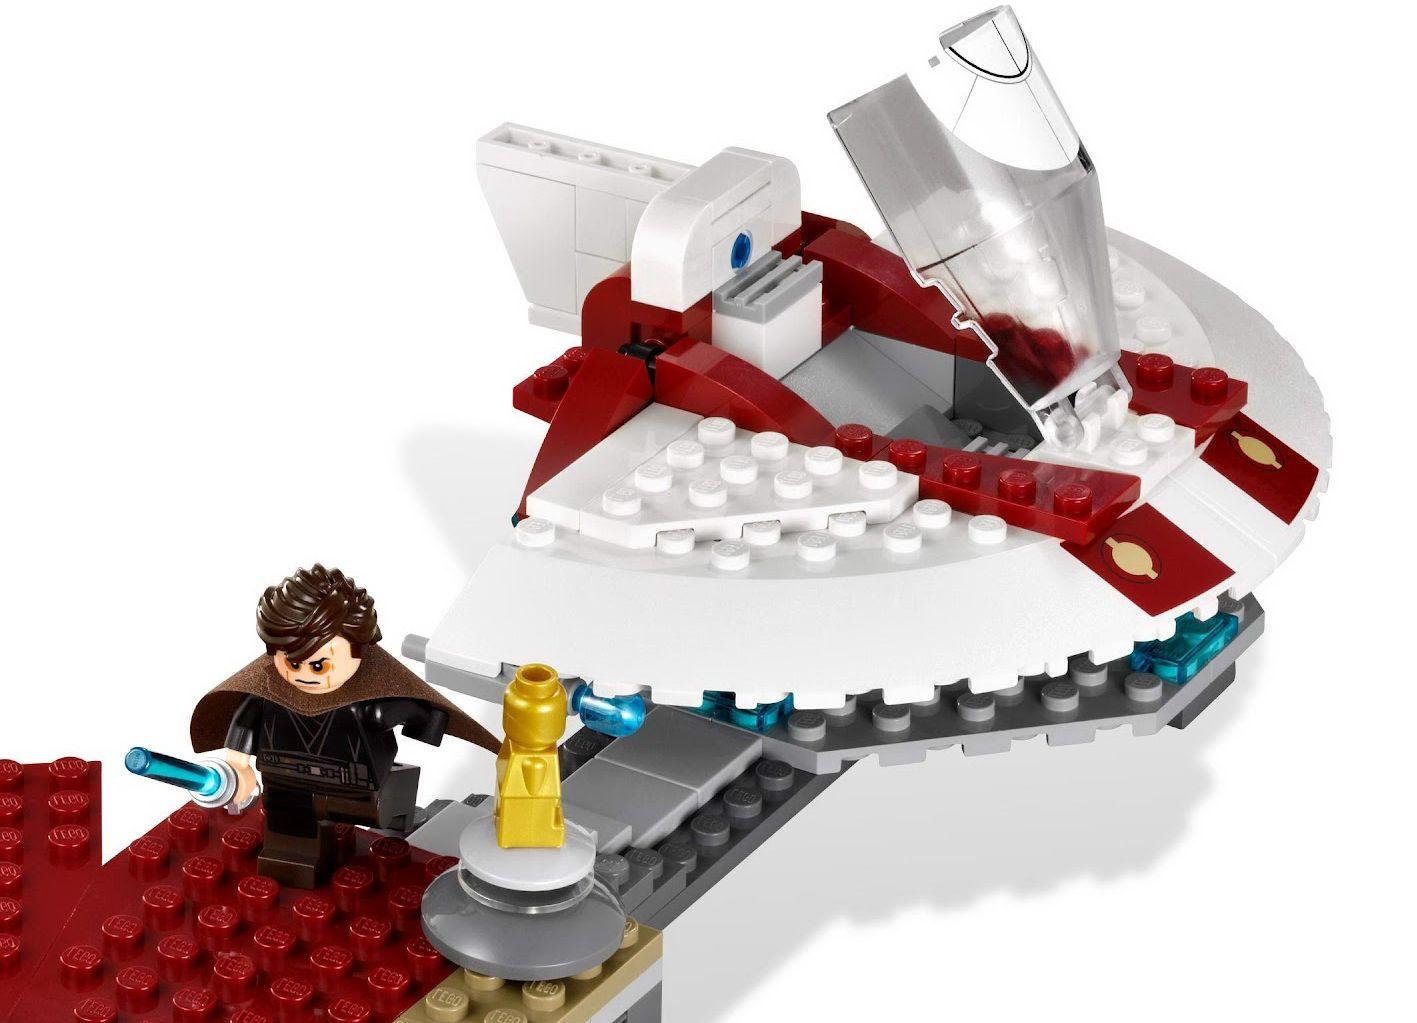 lego star wars droid escape 9490 instructions